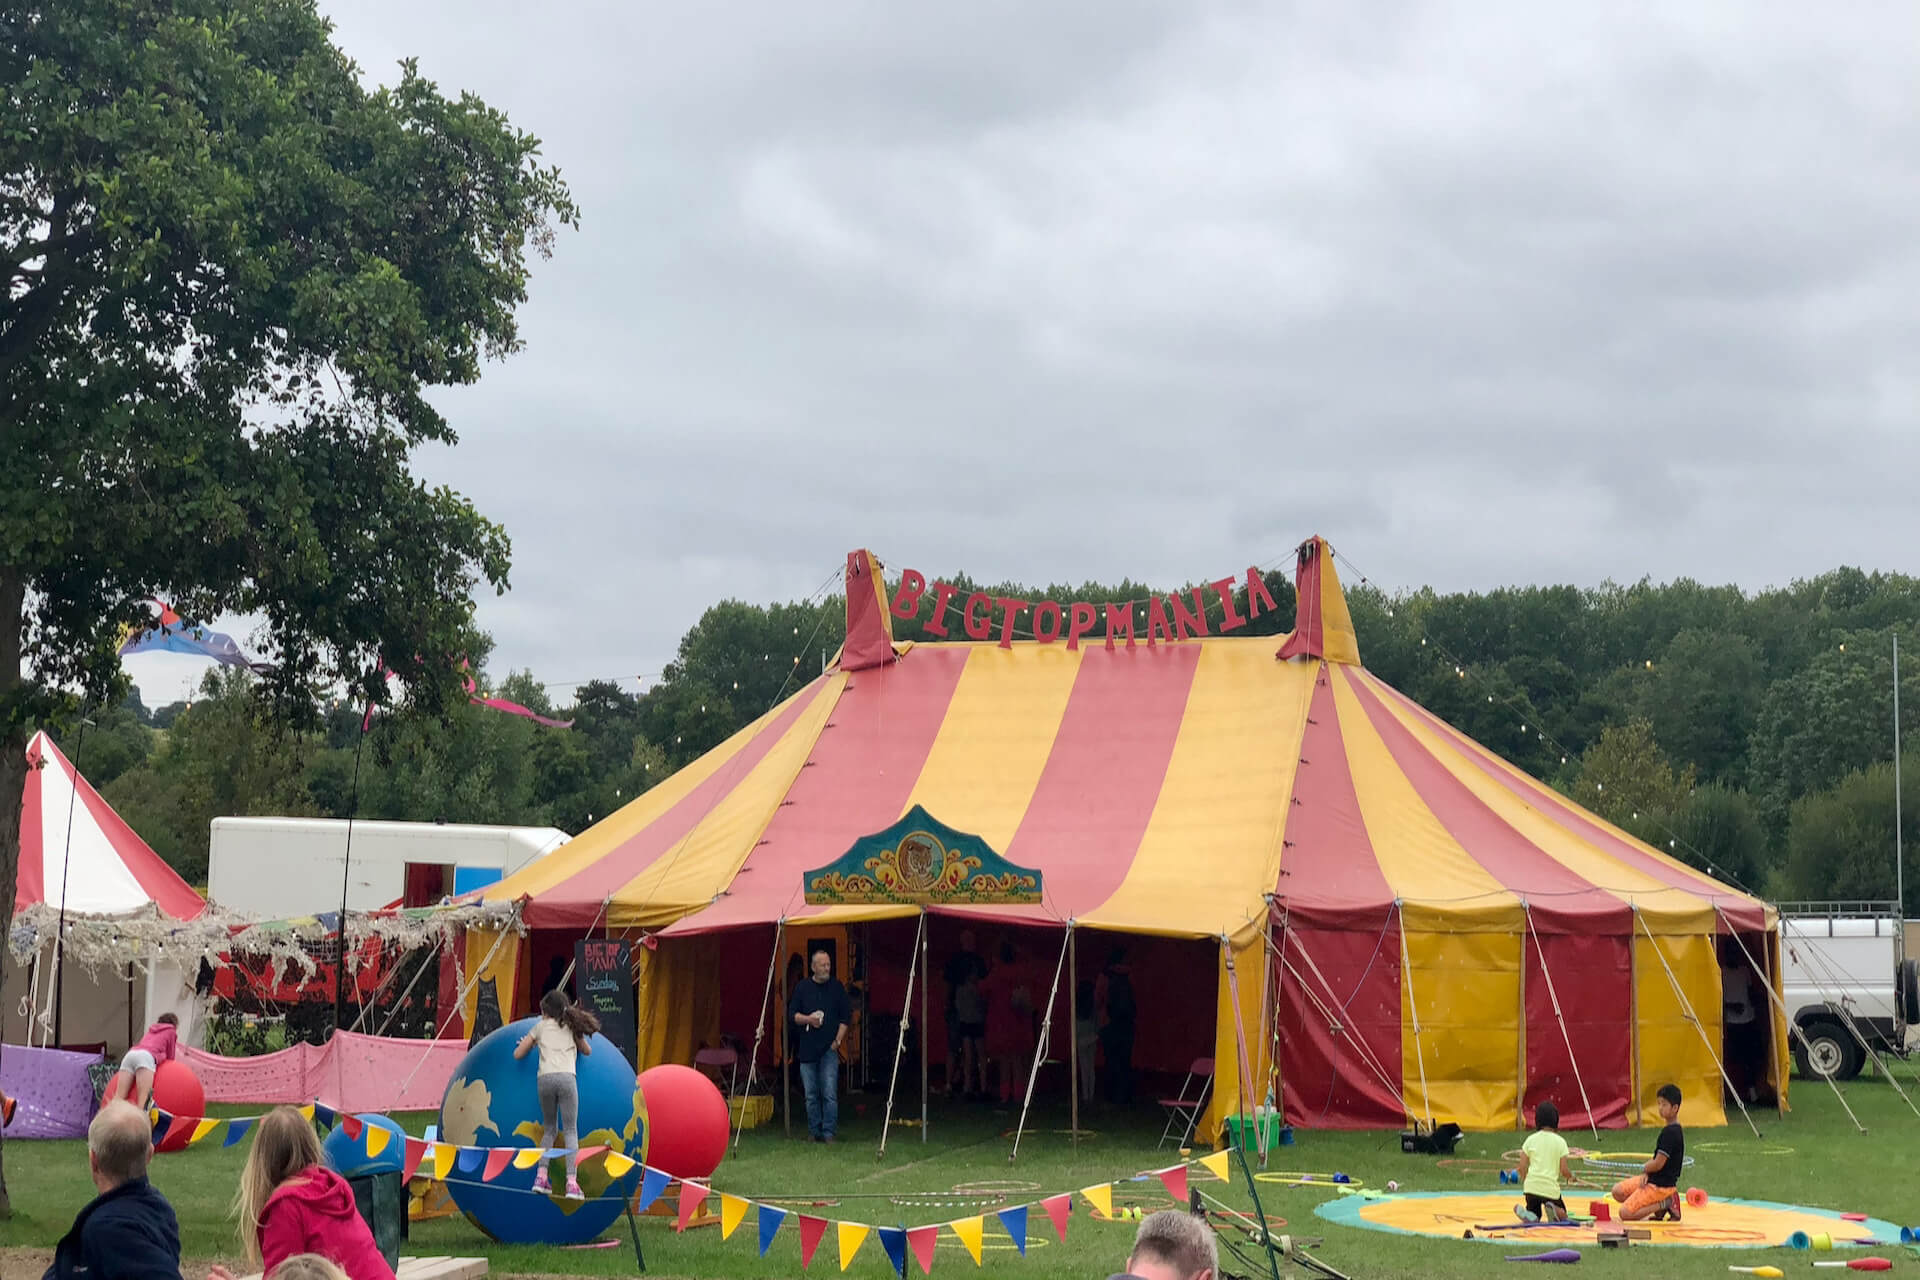 Bigtopmania pop up circus show tent near London